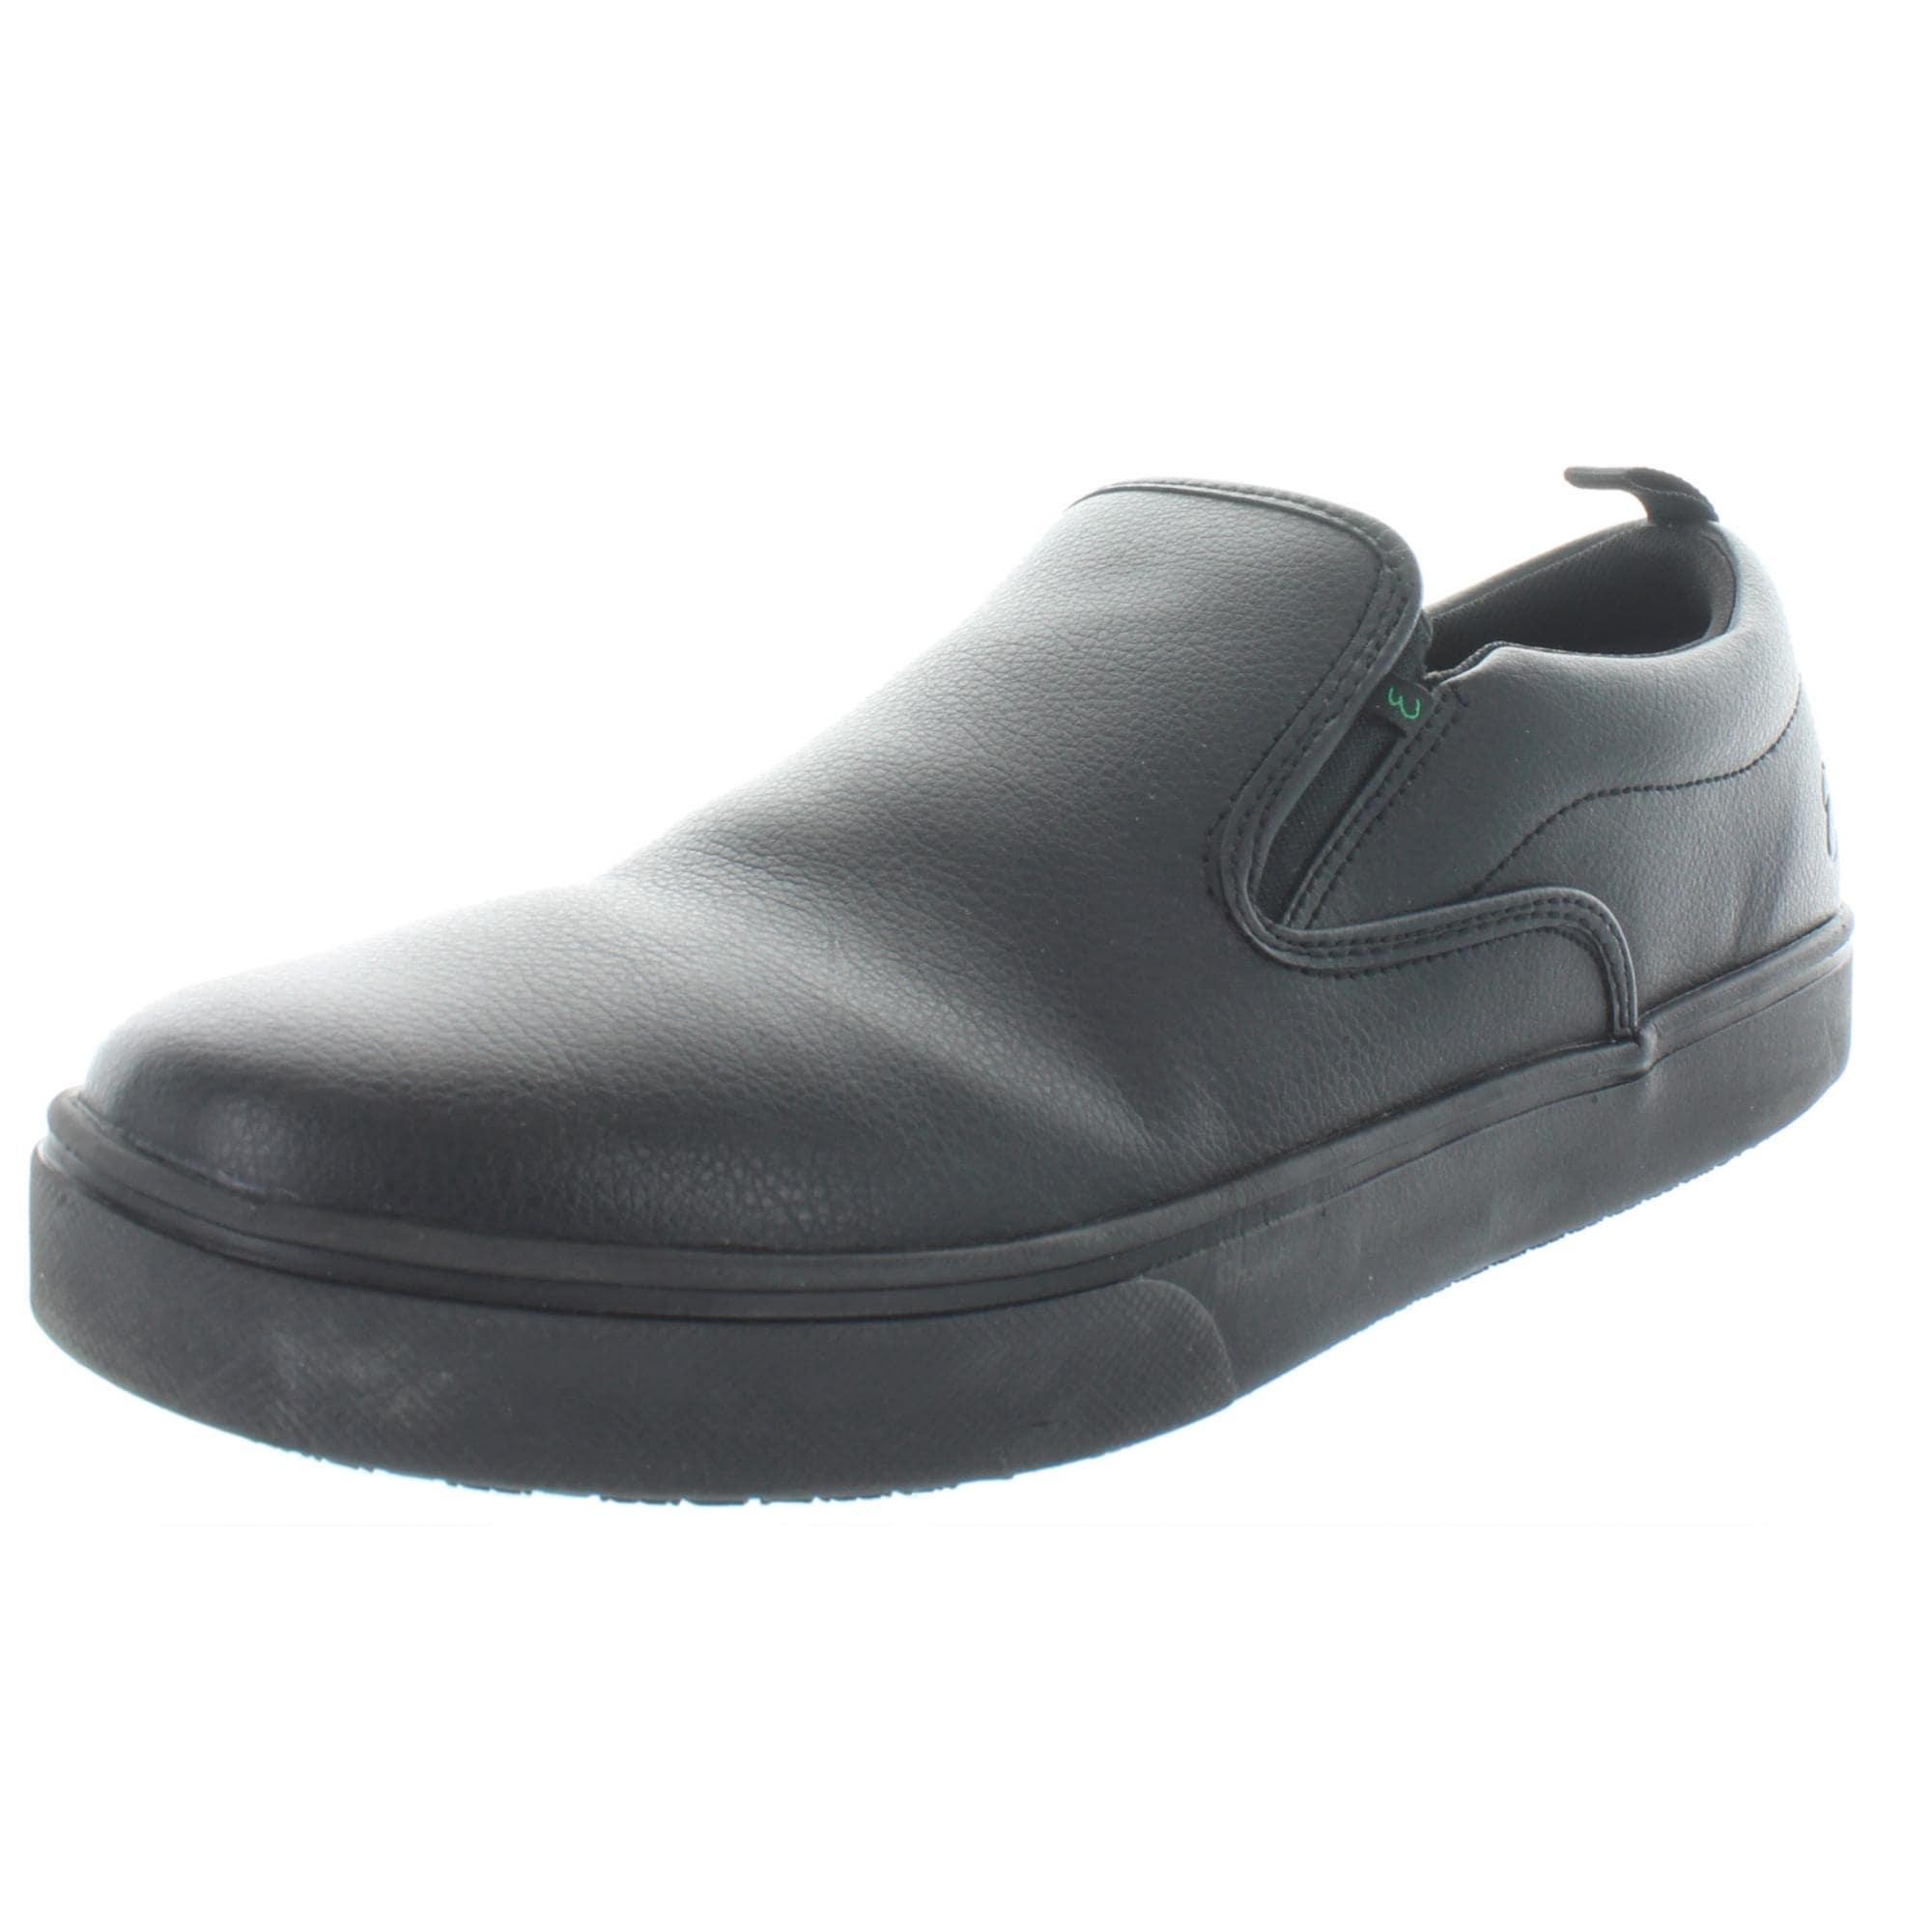 Shoes Slip Resistant Memory Foam